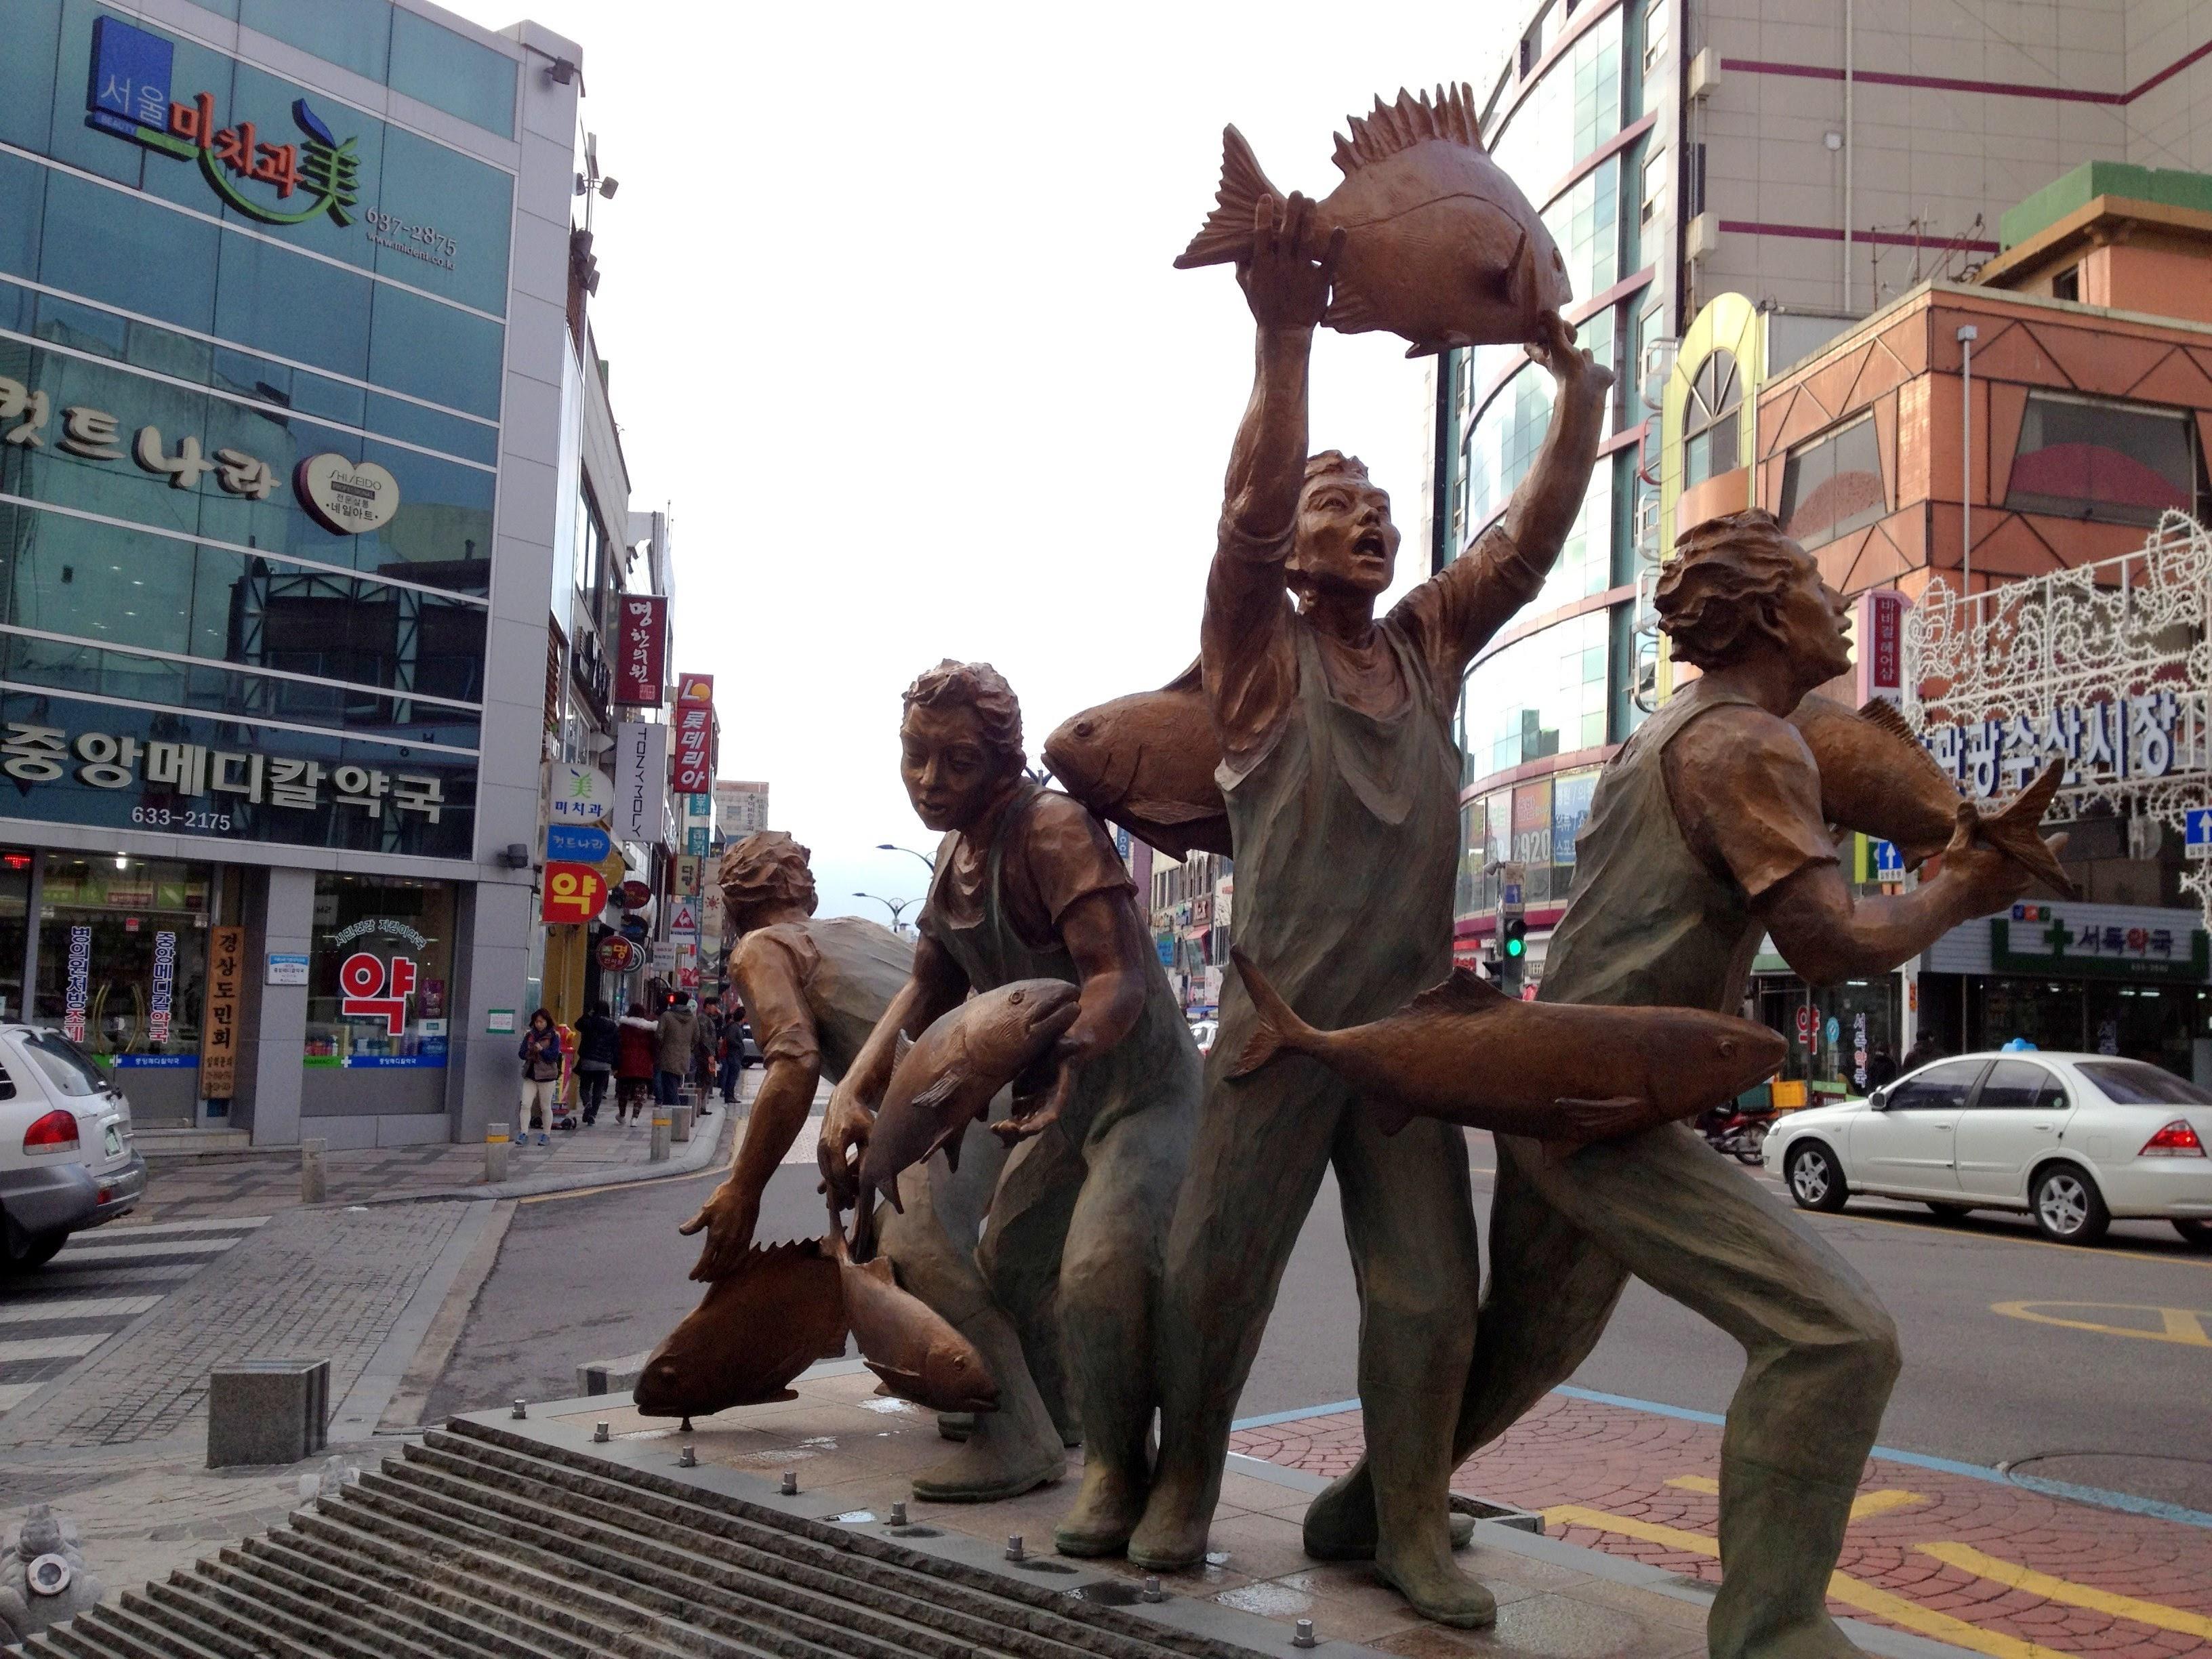 Fisherman status in the center of Sokcho, Korea